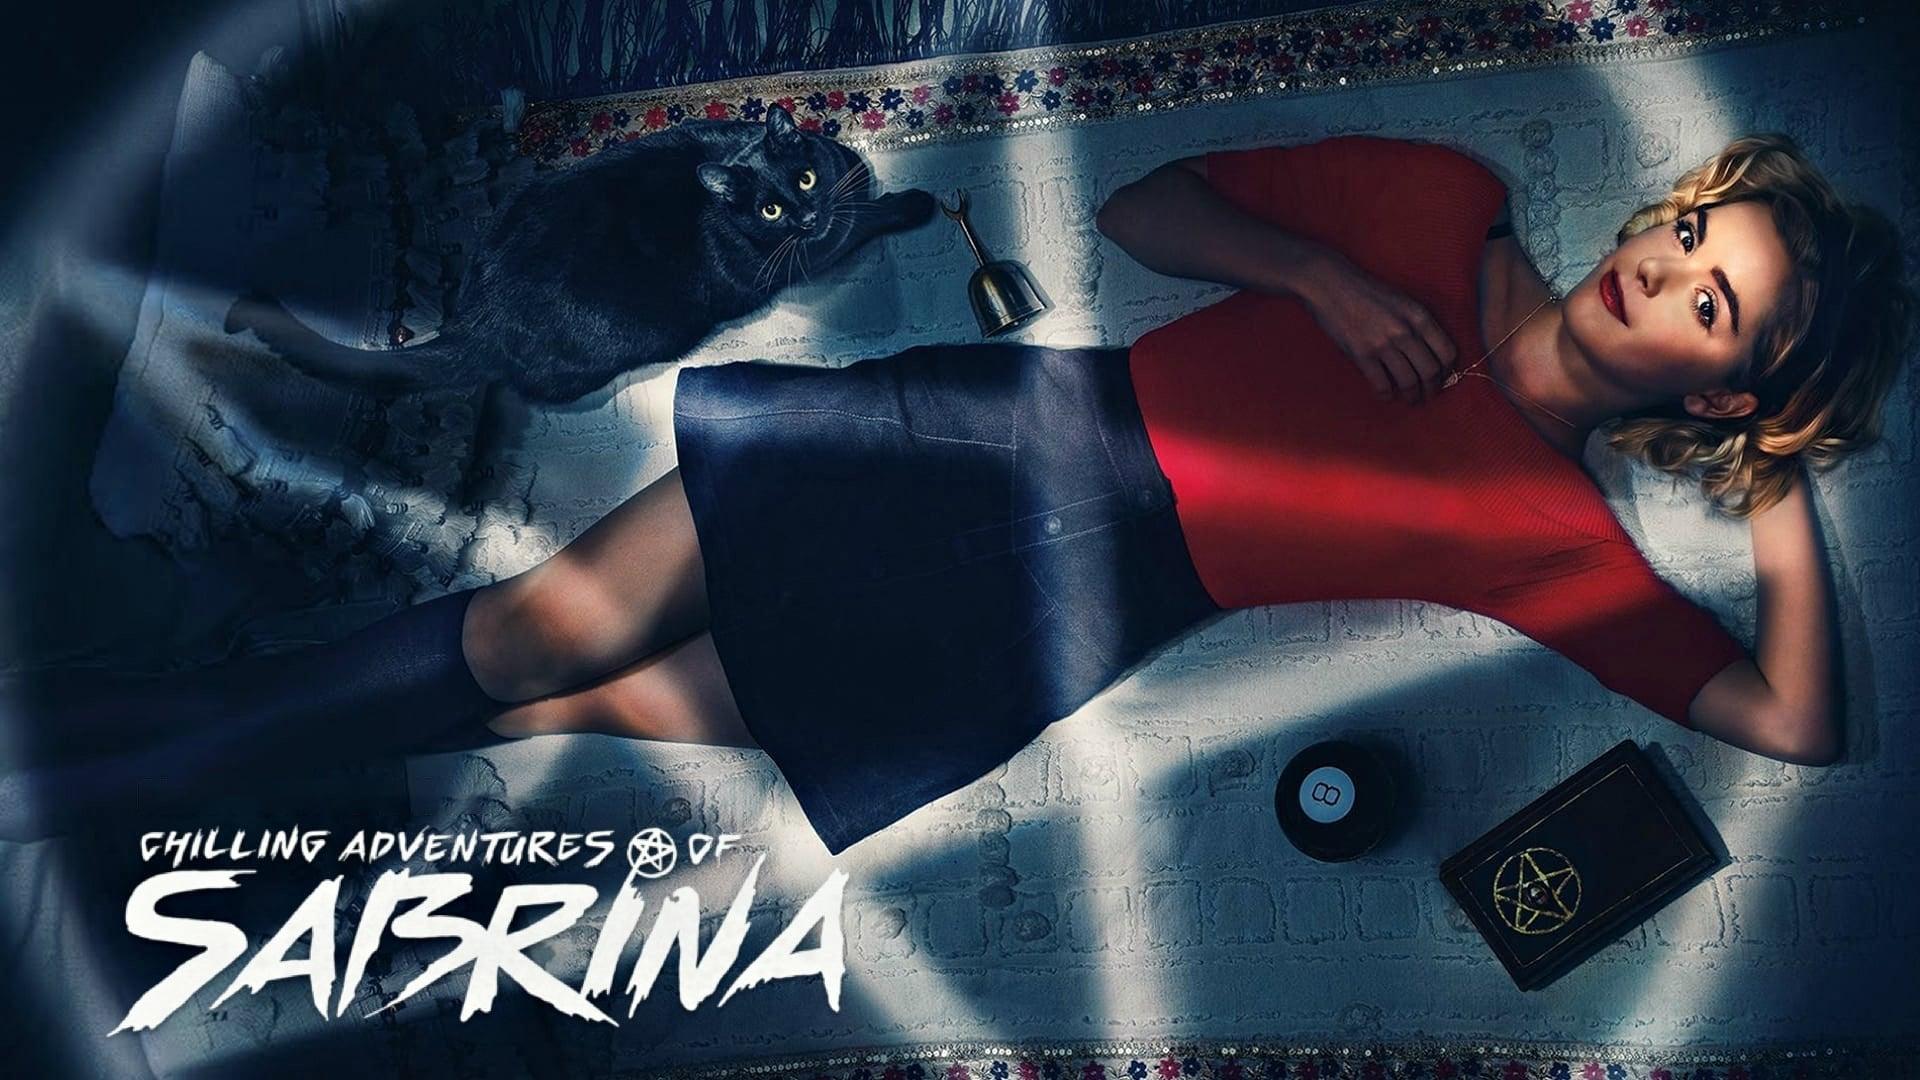 Chilling Adventures of Sabrina - Season 2